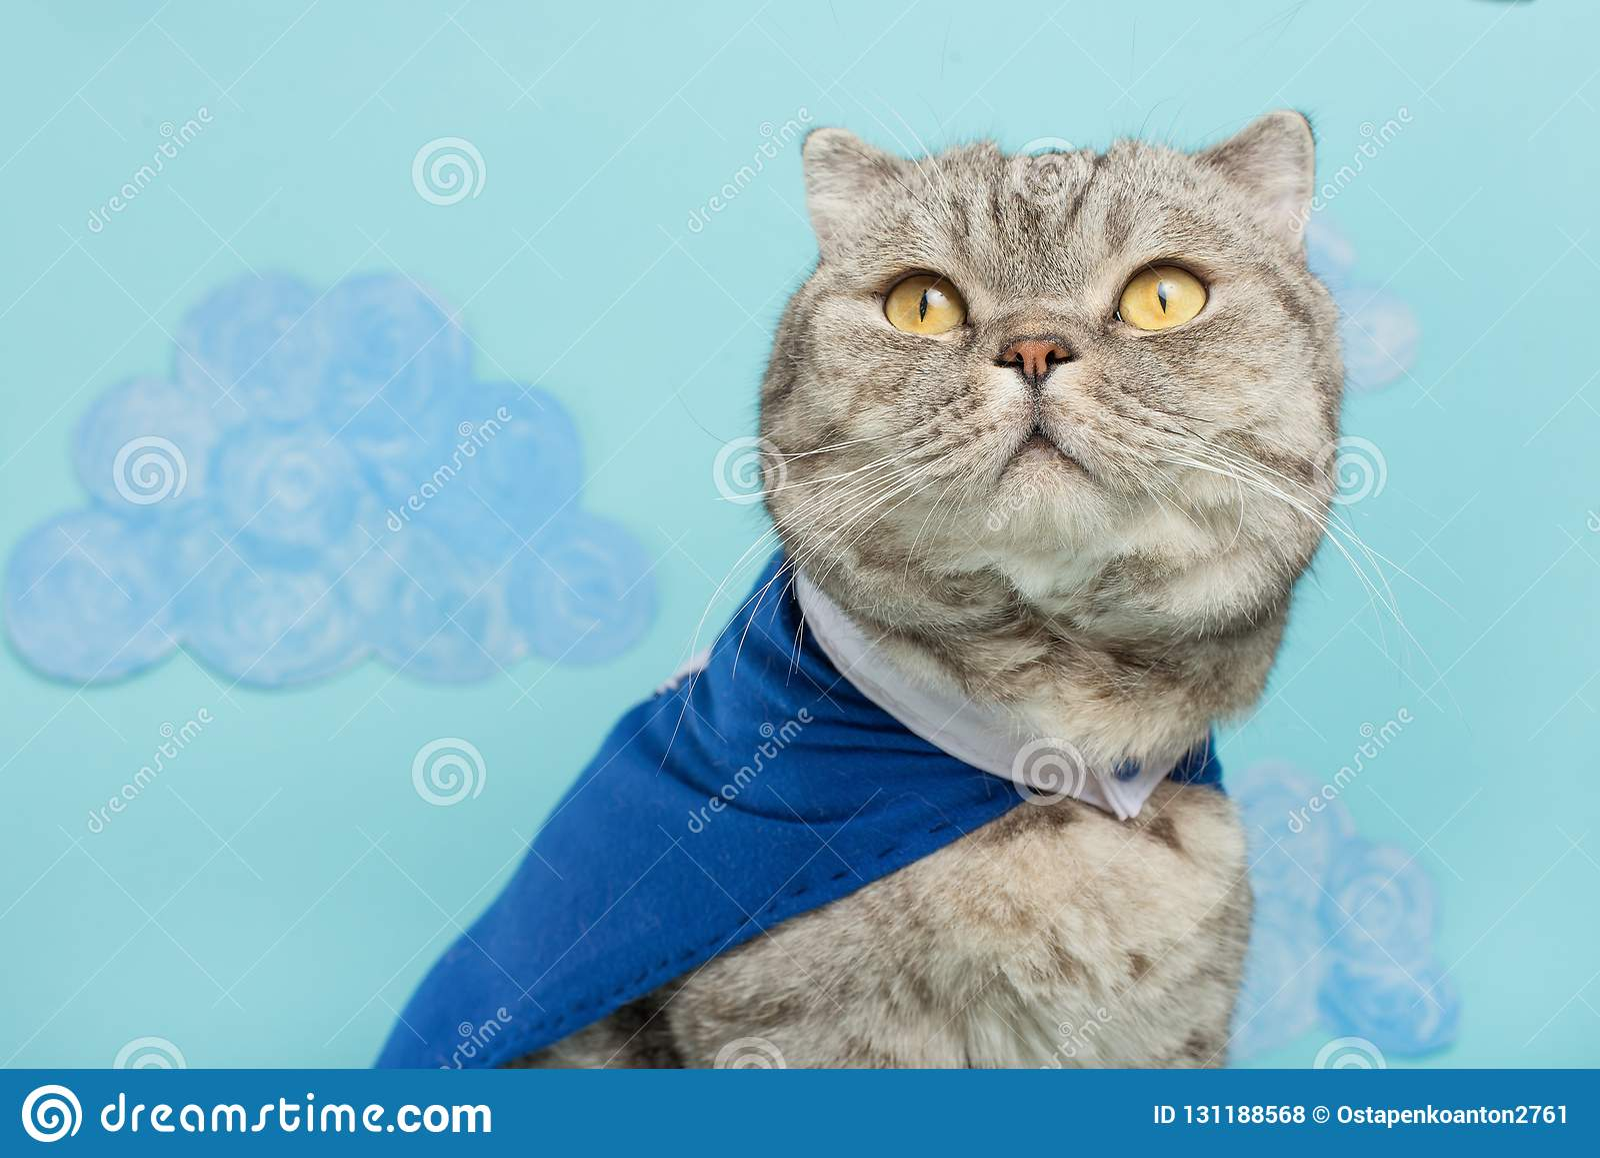 superhero cat, in a blue raincoat